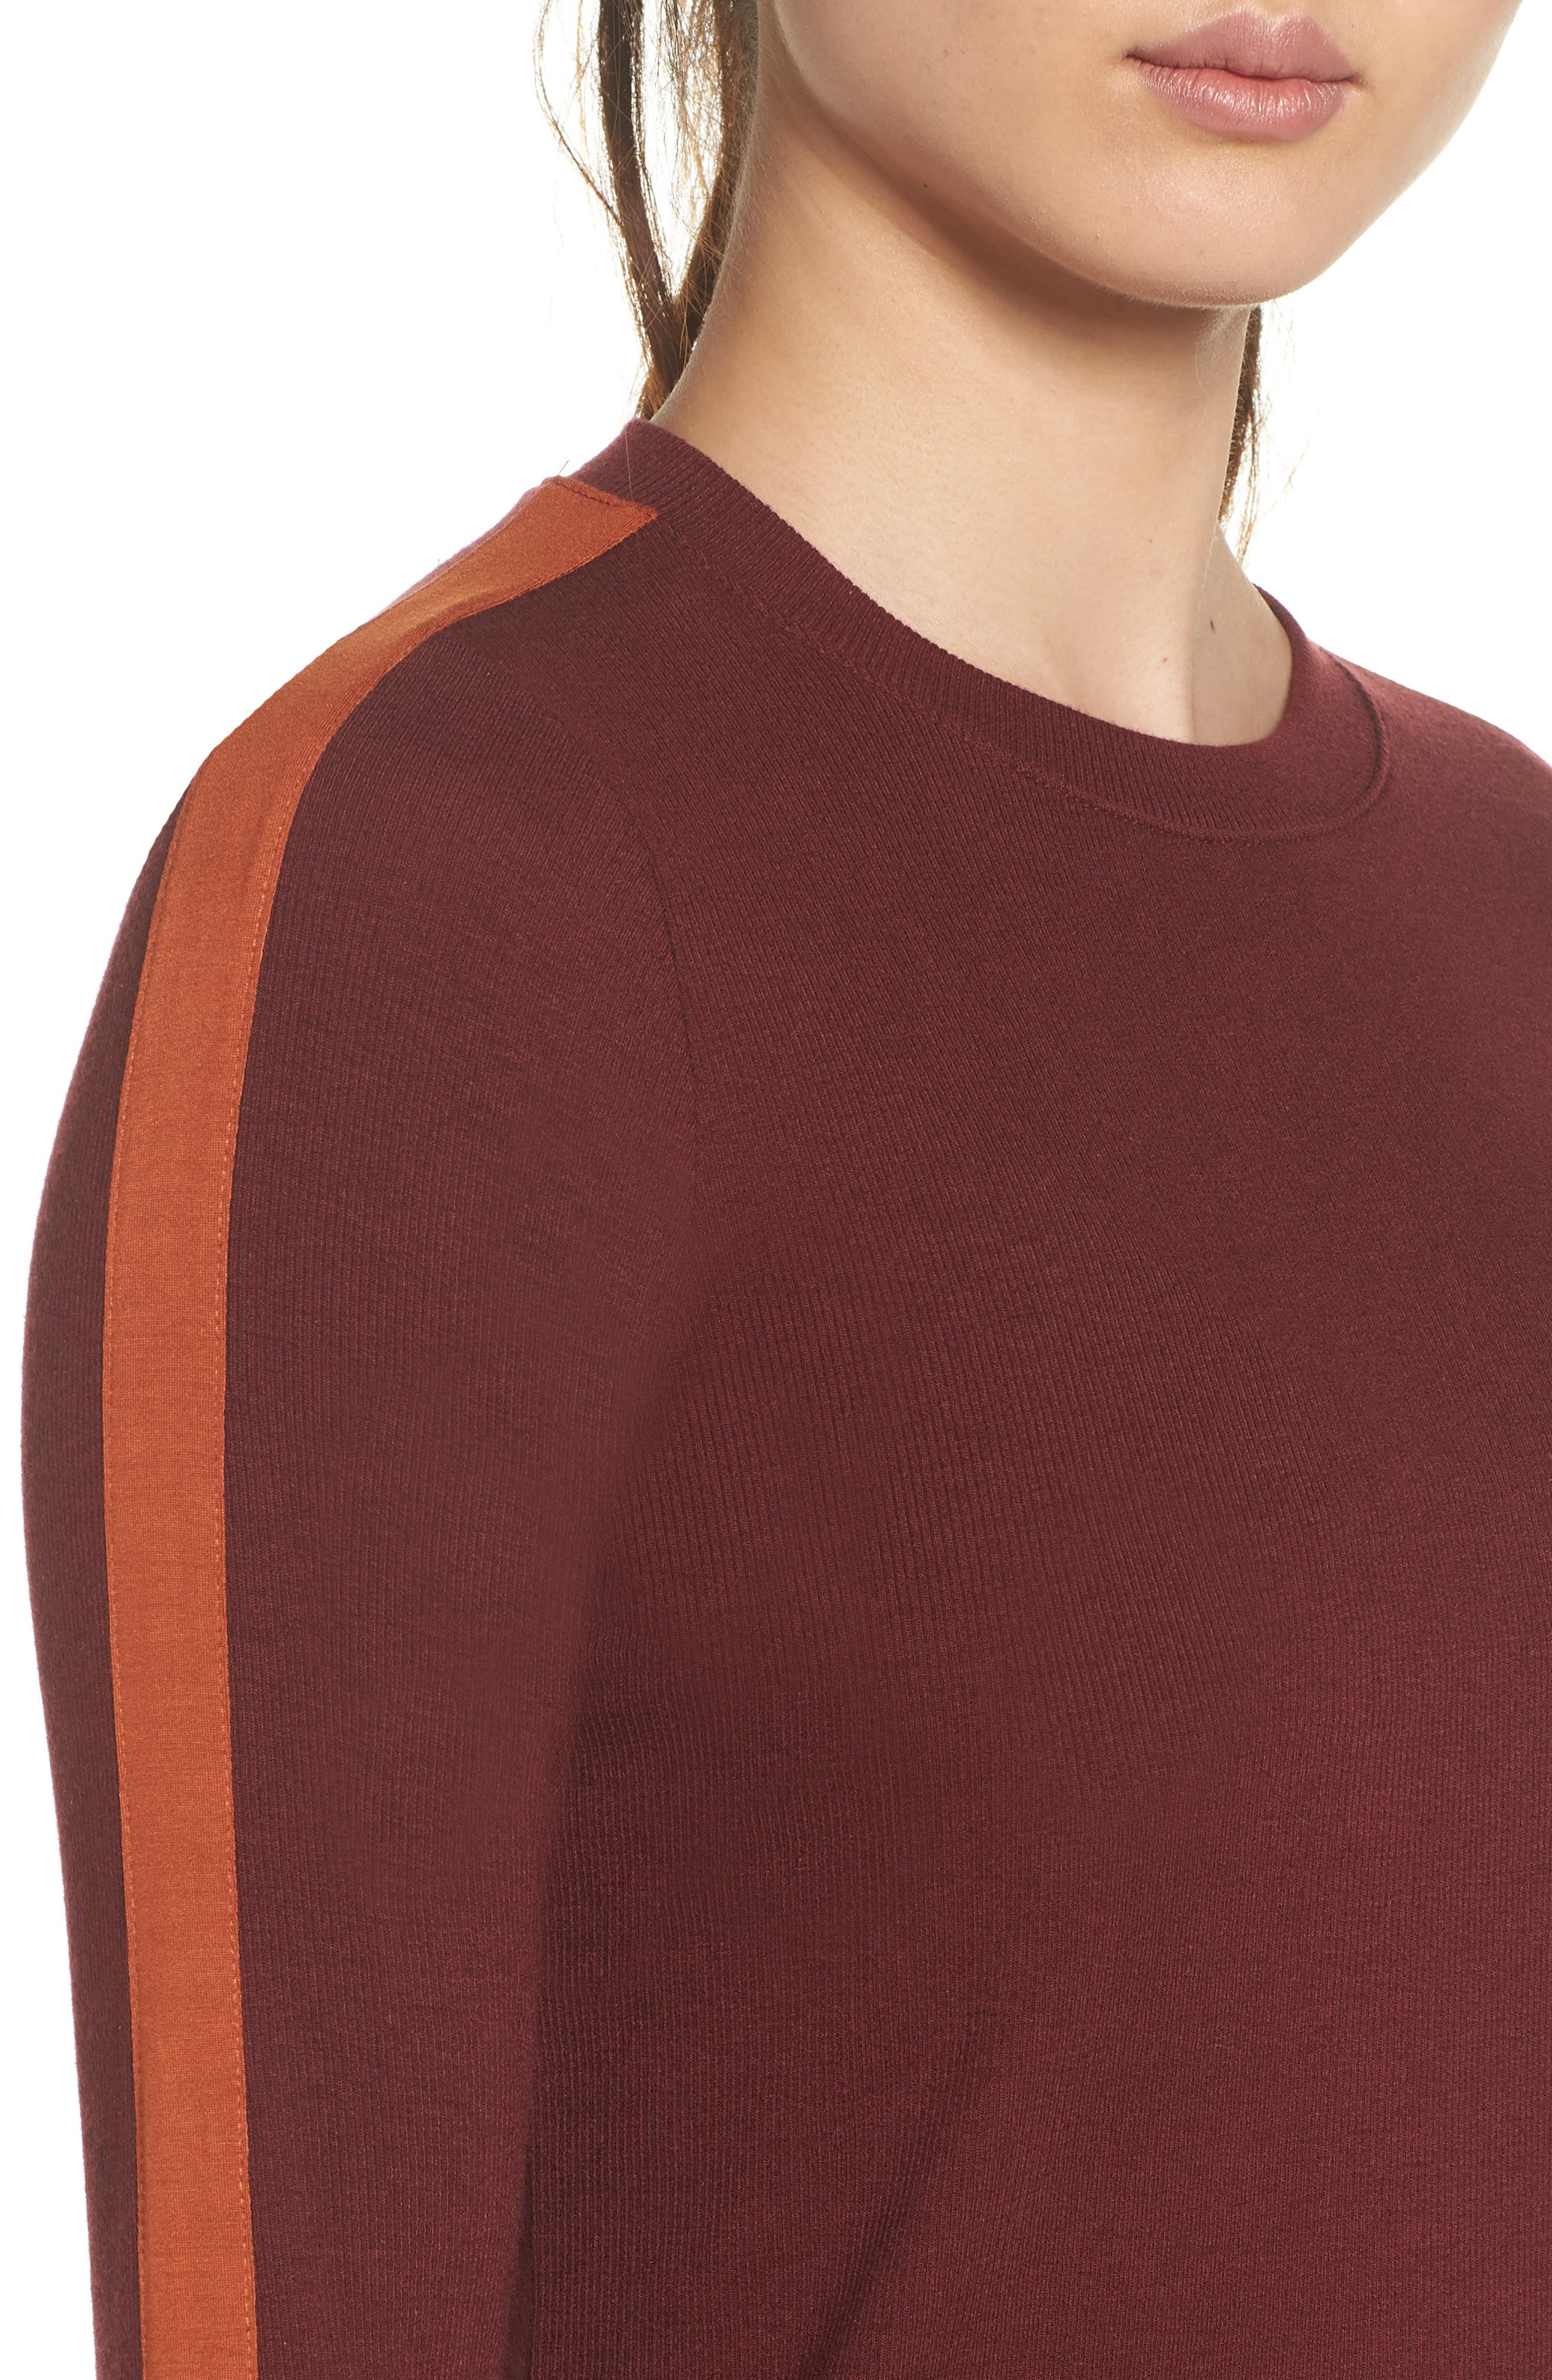 Defender Long-Sleeve Tee,                             Alternate thumbnail 3, color,                             Maroon/ Maple